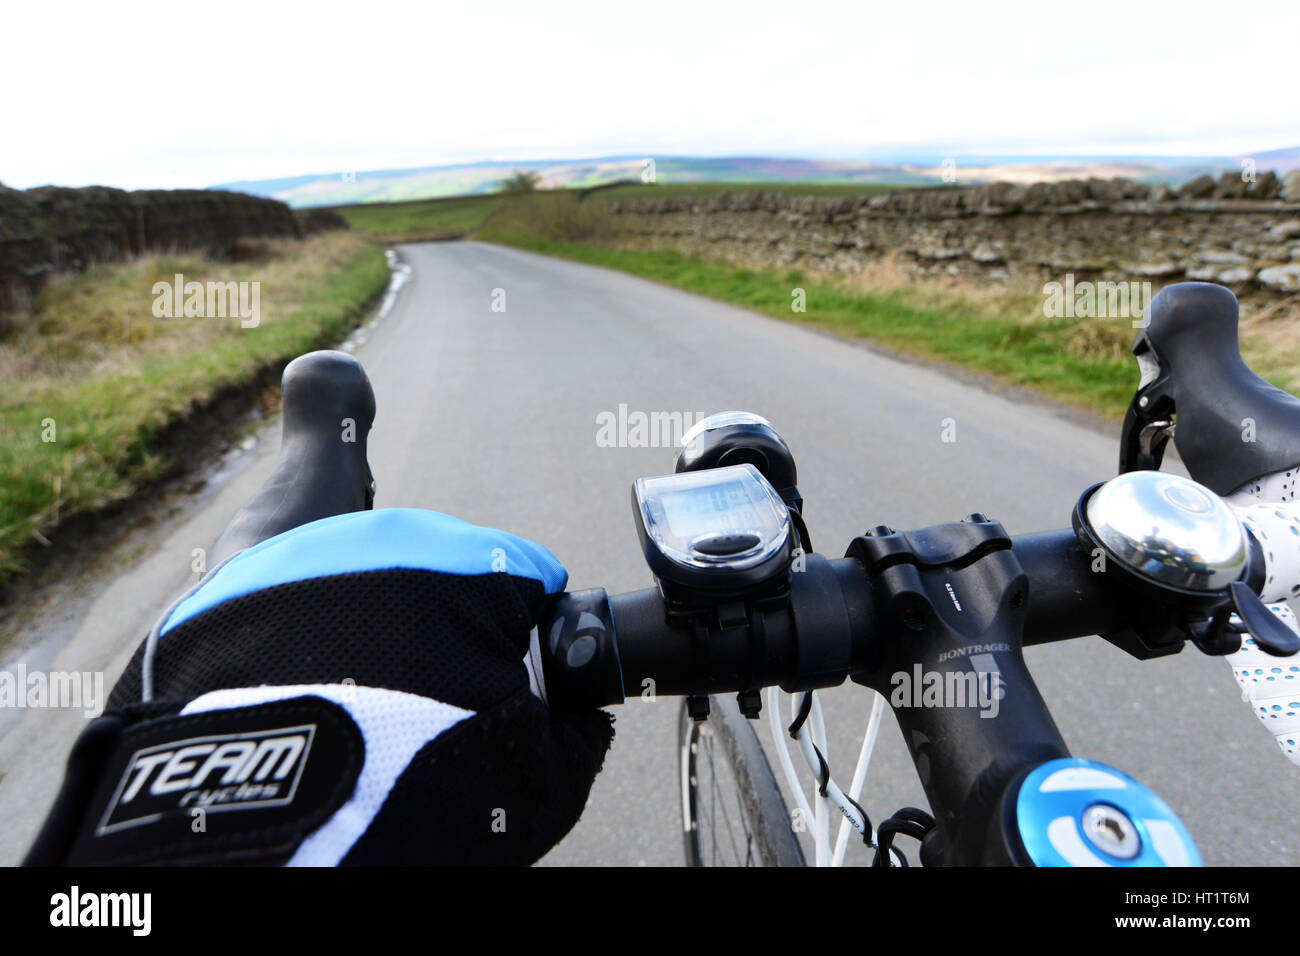 Motocicleta Manillar Carretera sujetado bajo Street-Azul